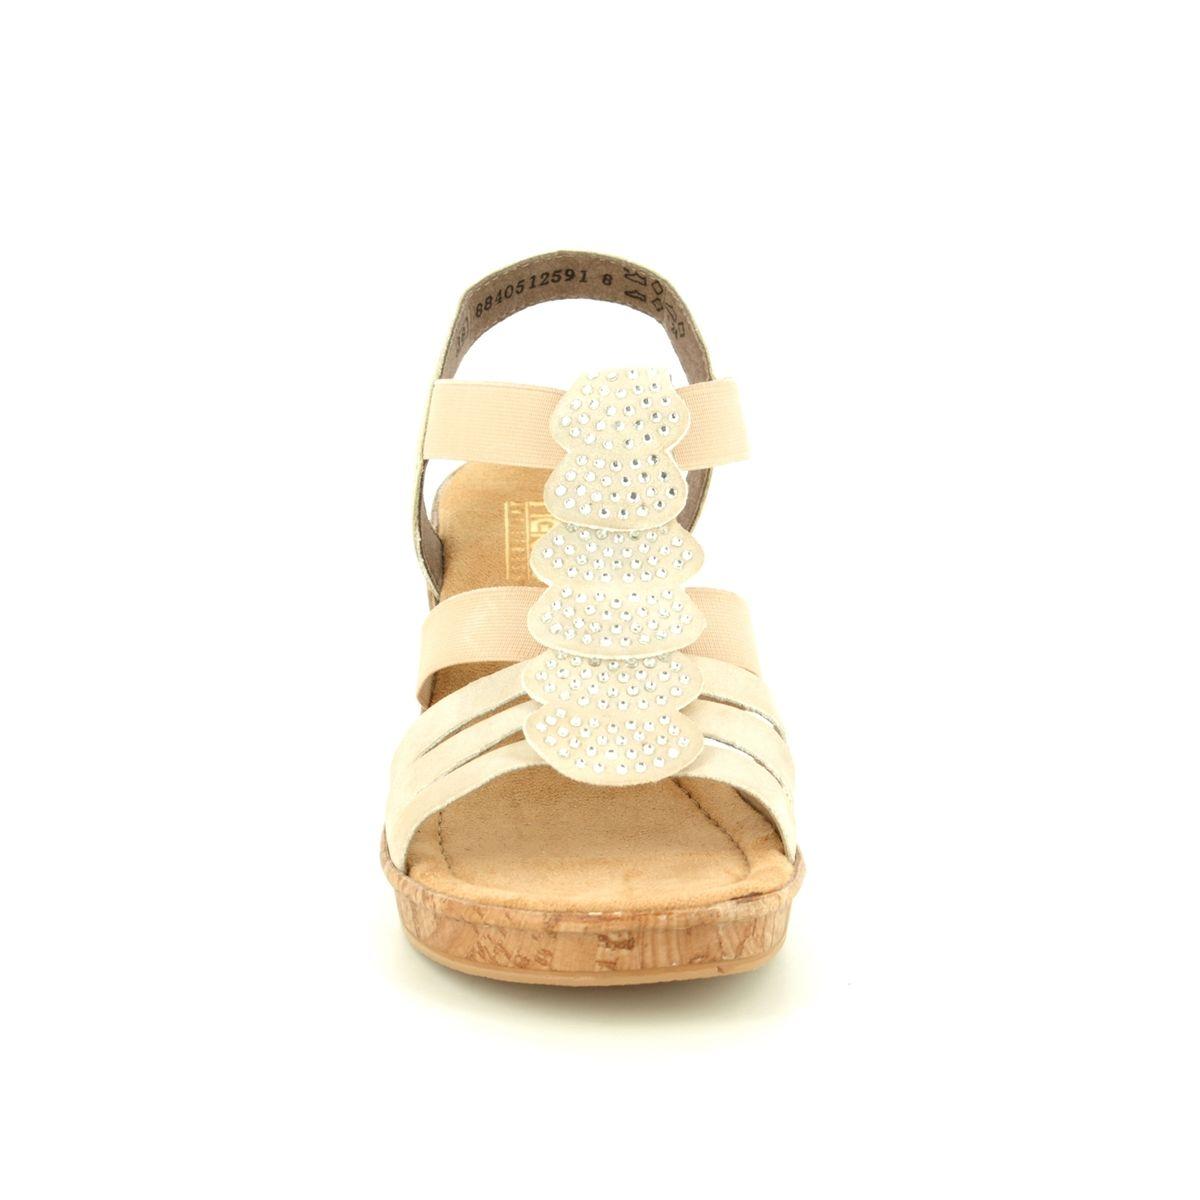 Rieker Sandals - Gold - 69702-60 ROBRUFFLE a2580ced34